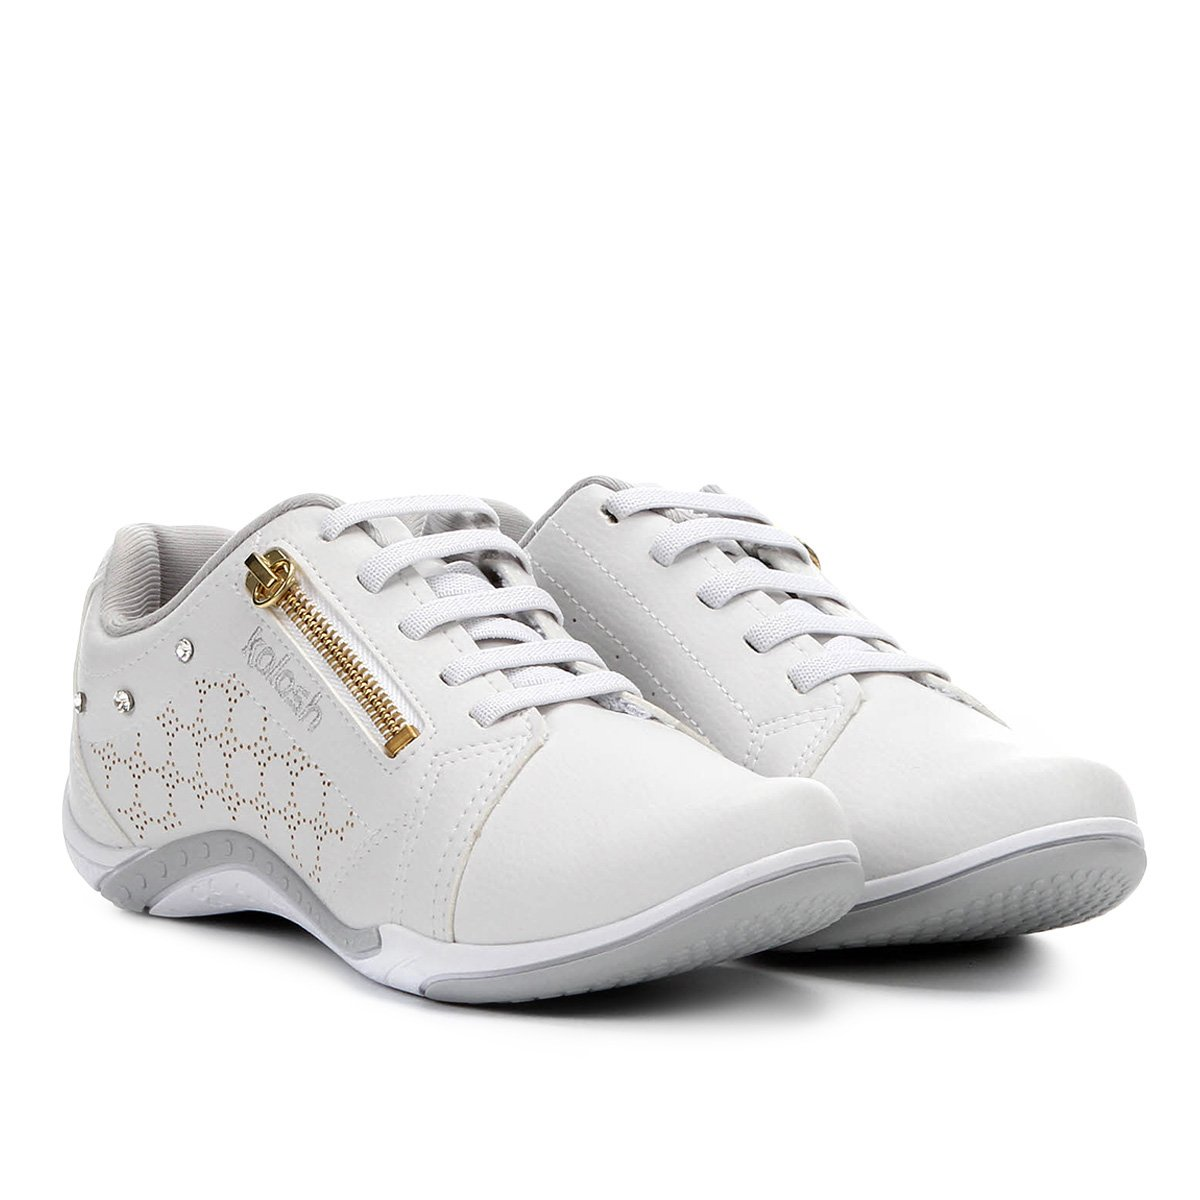 2d158c856e7 Tênis kolosh zíper strass feminino branco compre agora netshoes jpg 544x544 Tenis  feminino kolosh